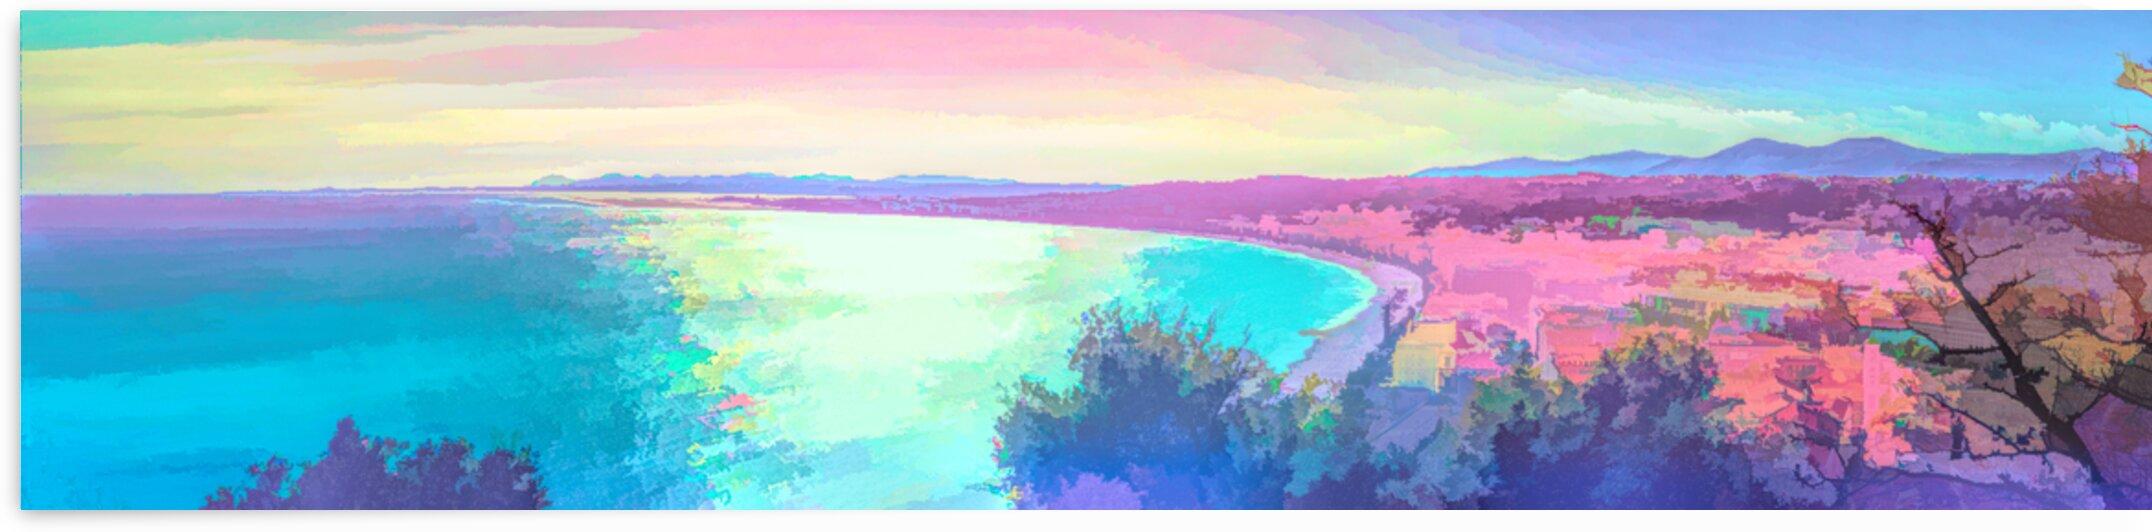 top panorama nice beach studio 3 by realimpressions